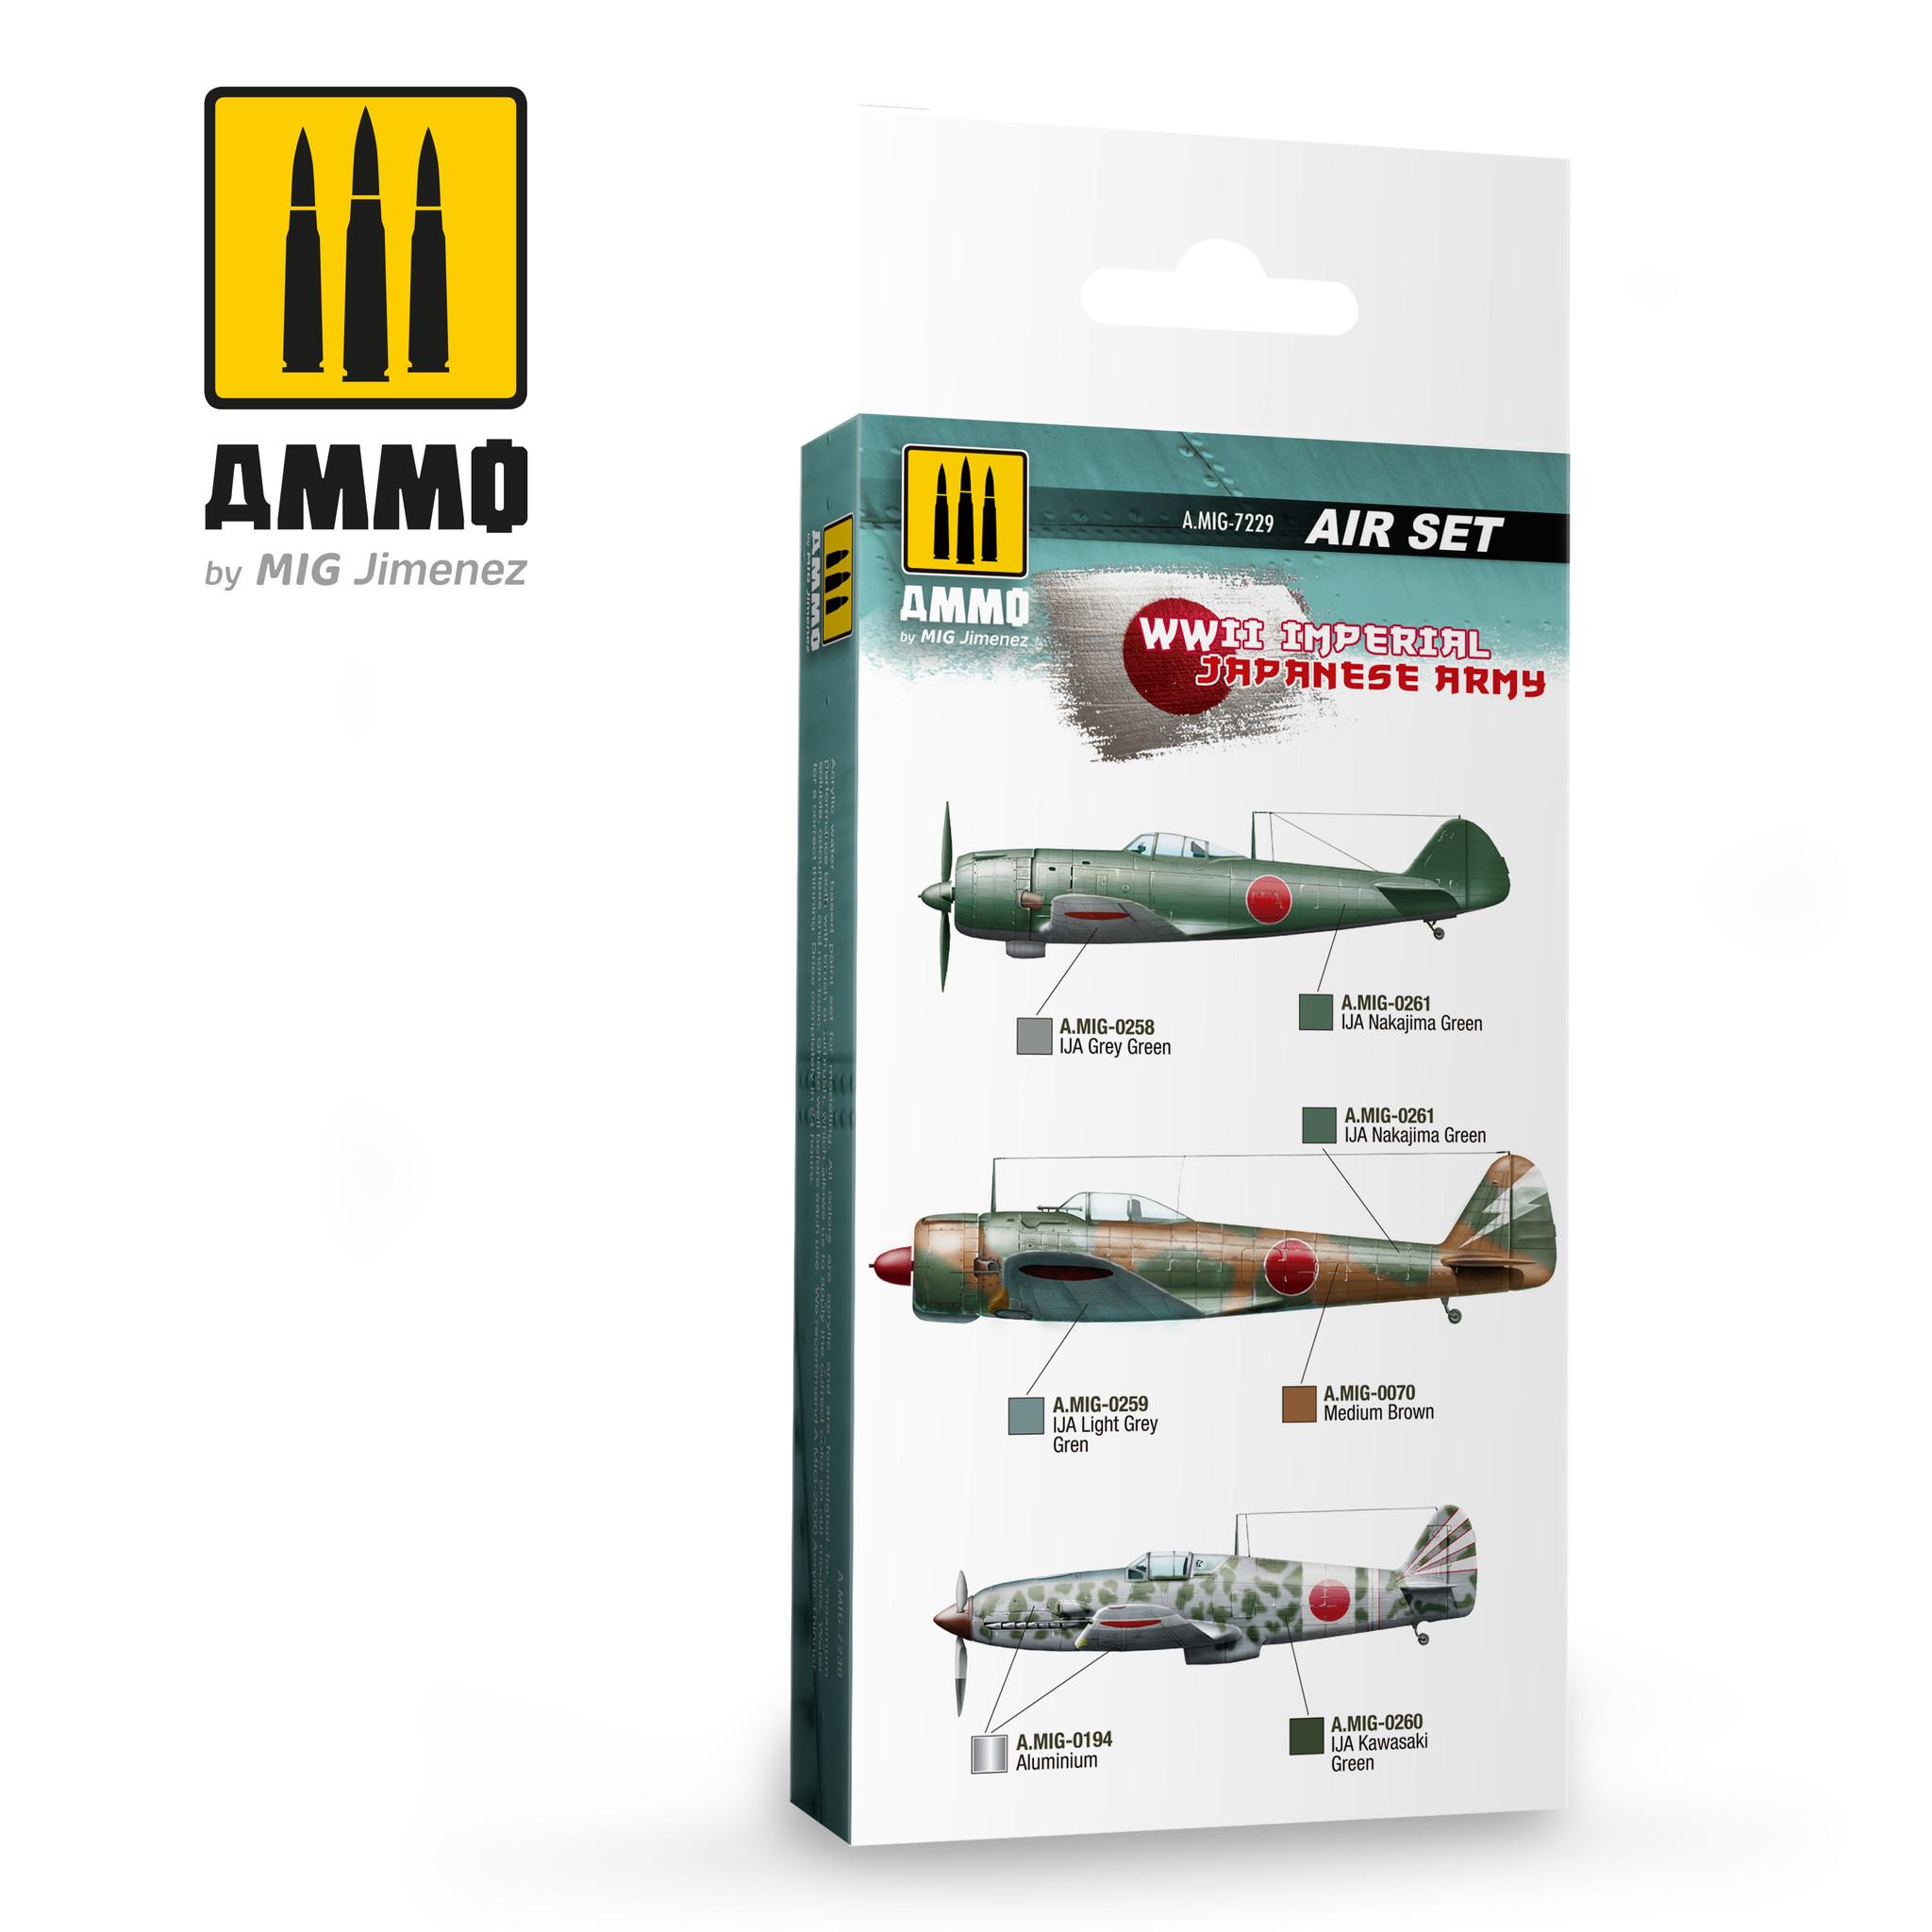 Ammo by Mig Jimenez WWII Imperial Japanese Army - Ammo by Mig Jimenez - A.MIG-7229